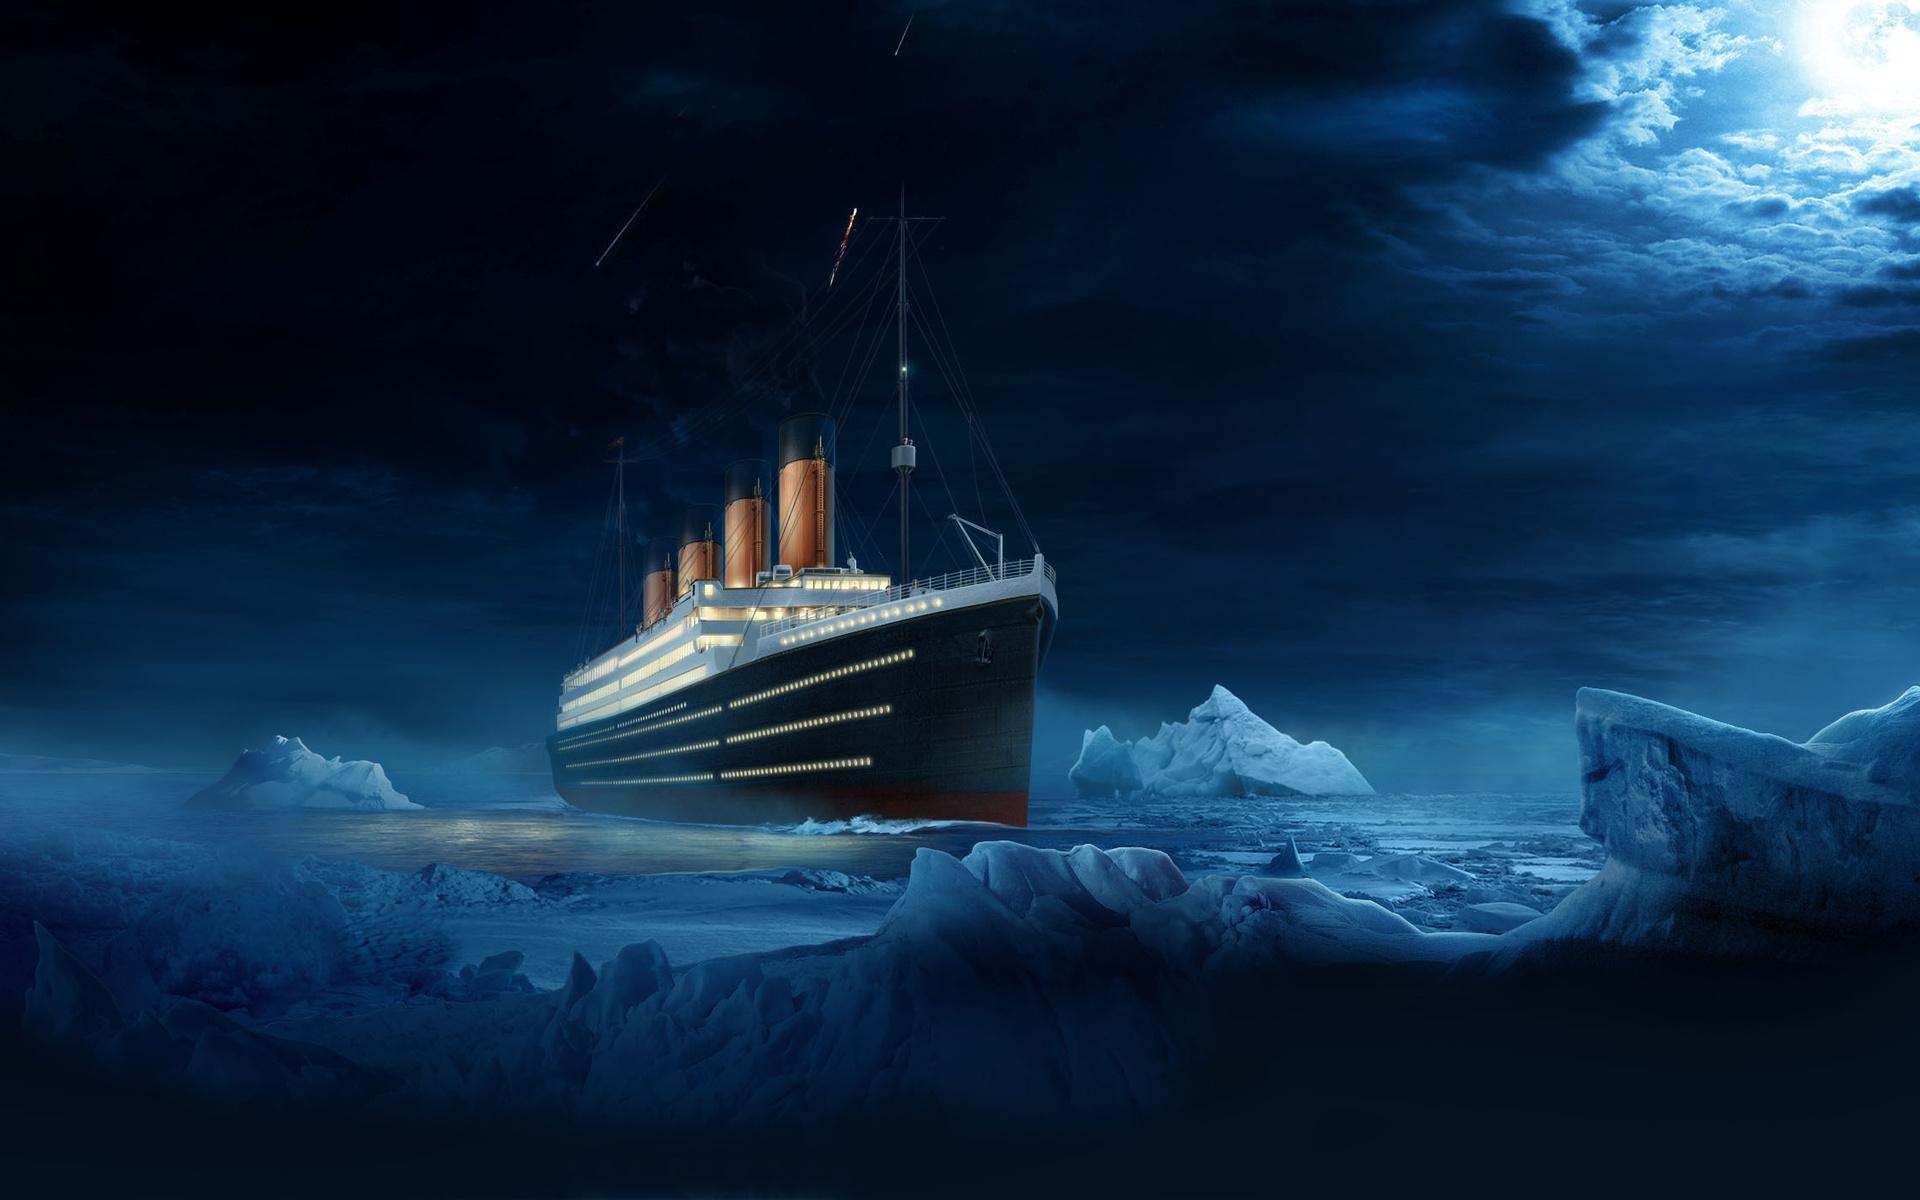 Ship titanic ship titanic water night wallpaper | 1920x1200 | 97804 ...: www.wallpaperup.com/97804/ship_titanic_ship_titanic_water_night.html